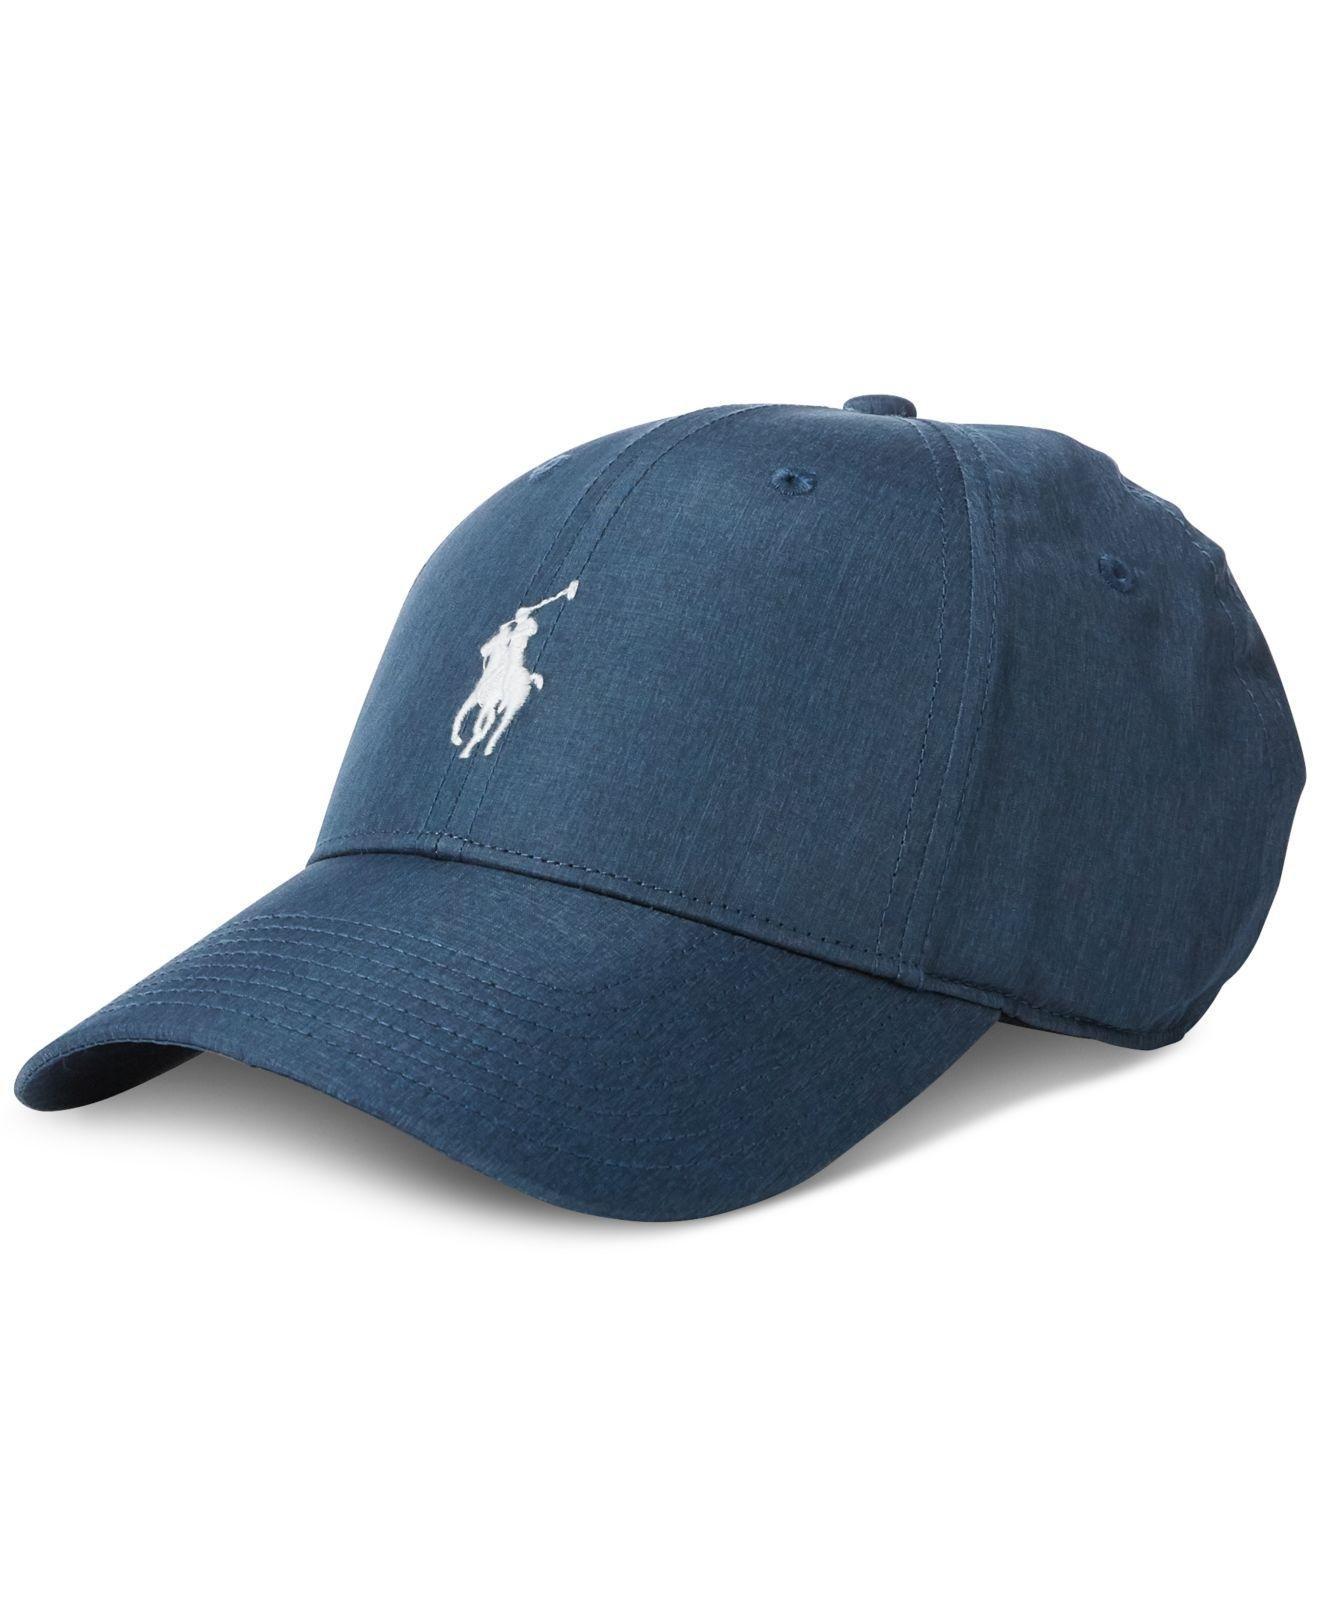 cb0f7fdd748 Lyst - Polo Ralph Lauren Performance Cap in Blue for Men